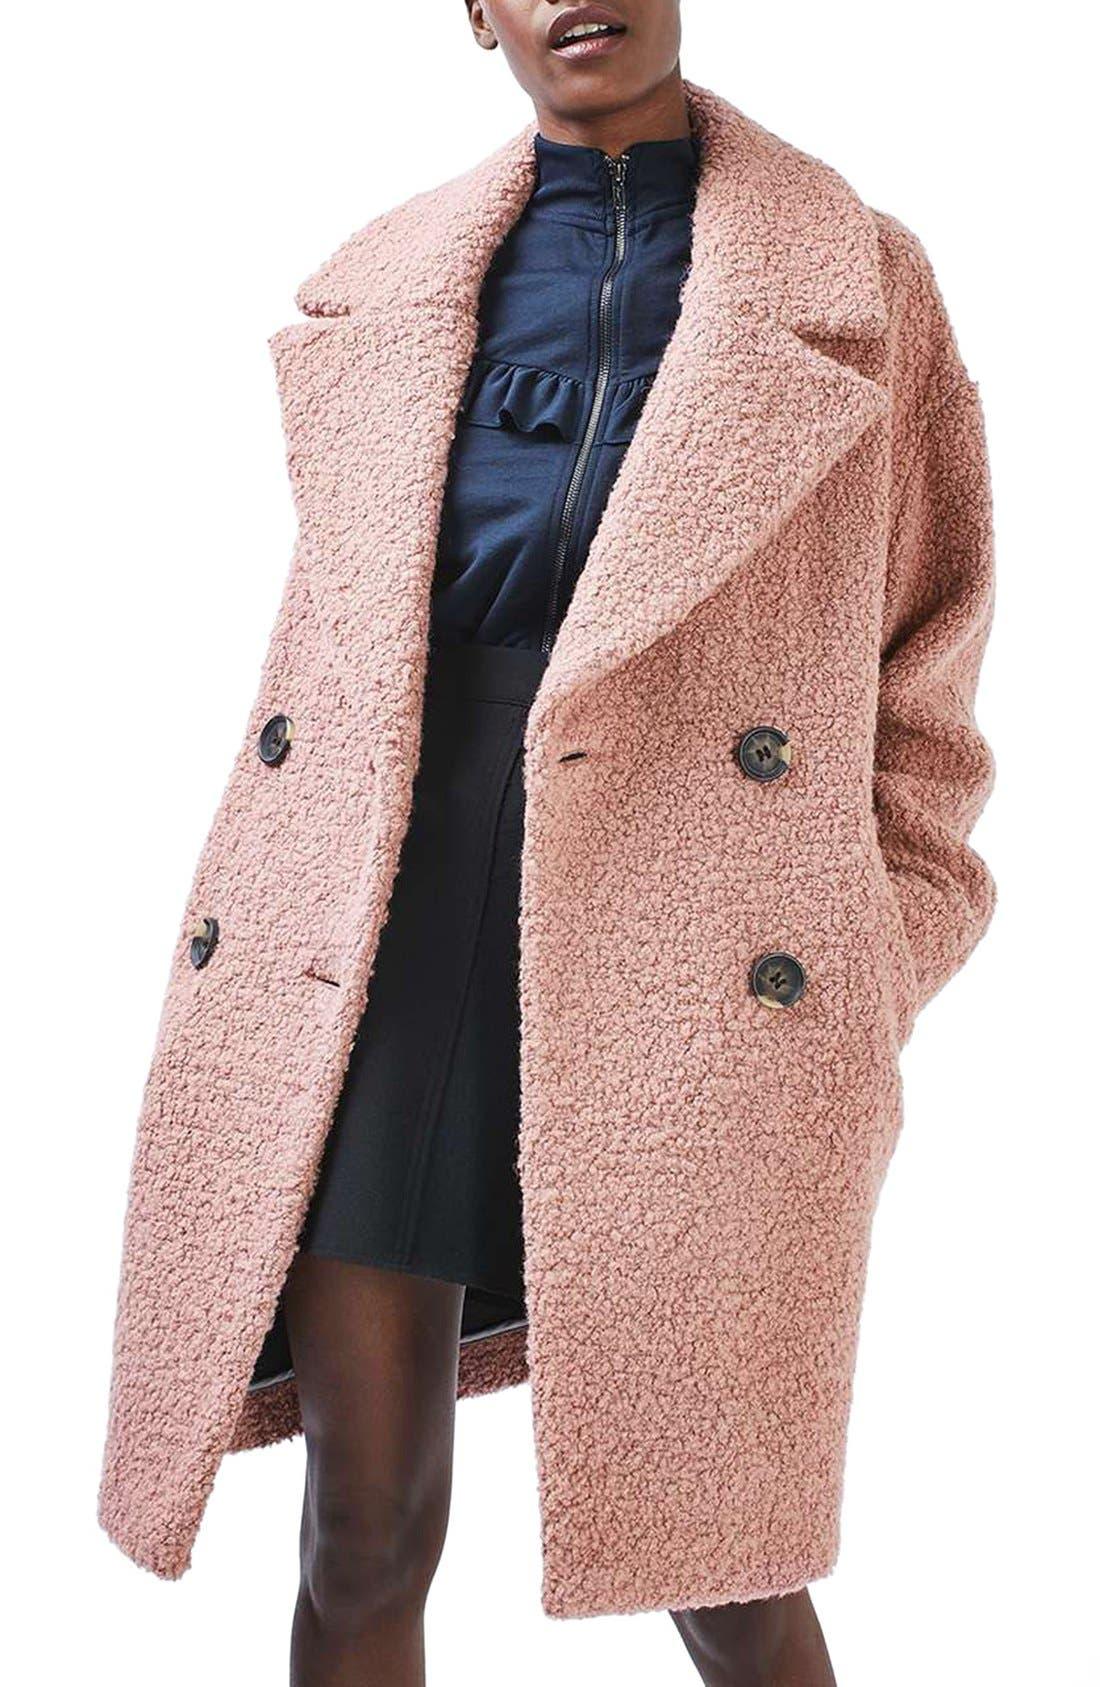 Main Image - Topshop Alicia Bouclé Coat